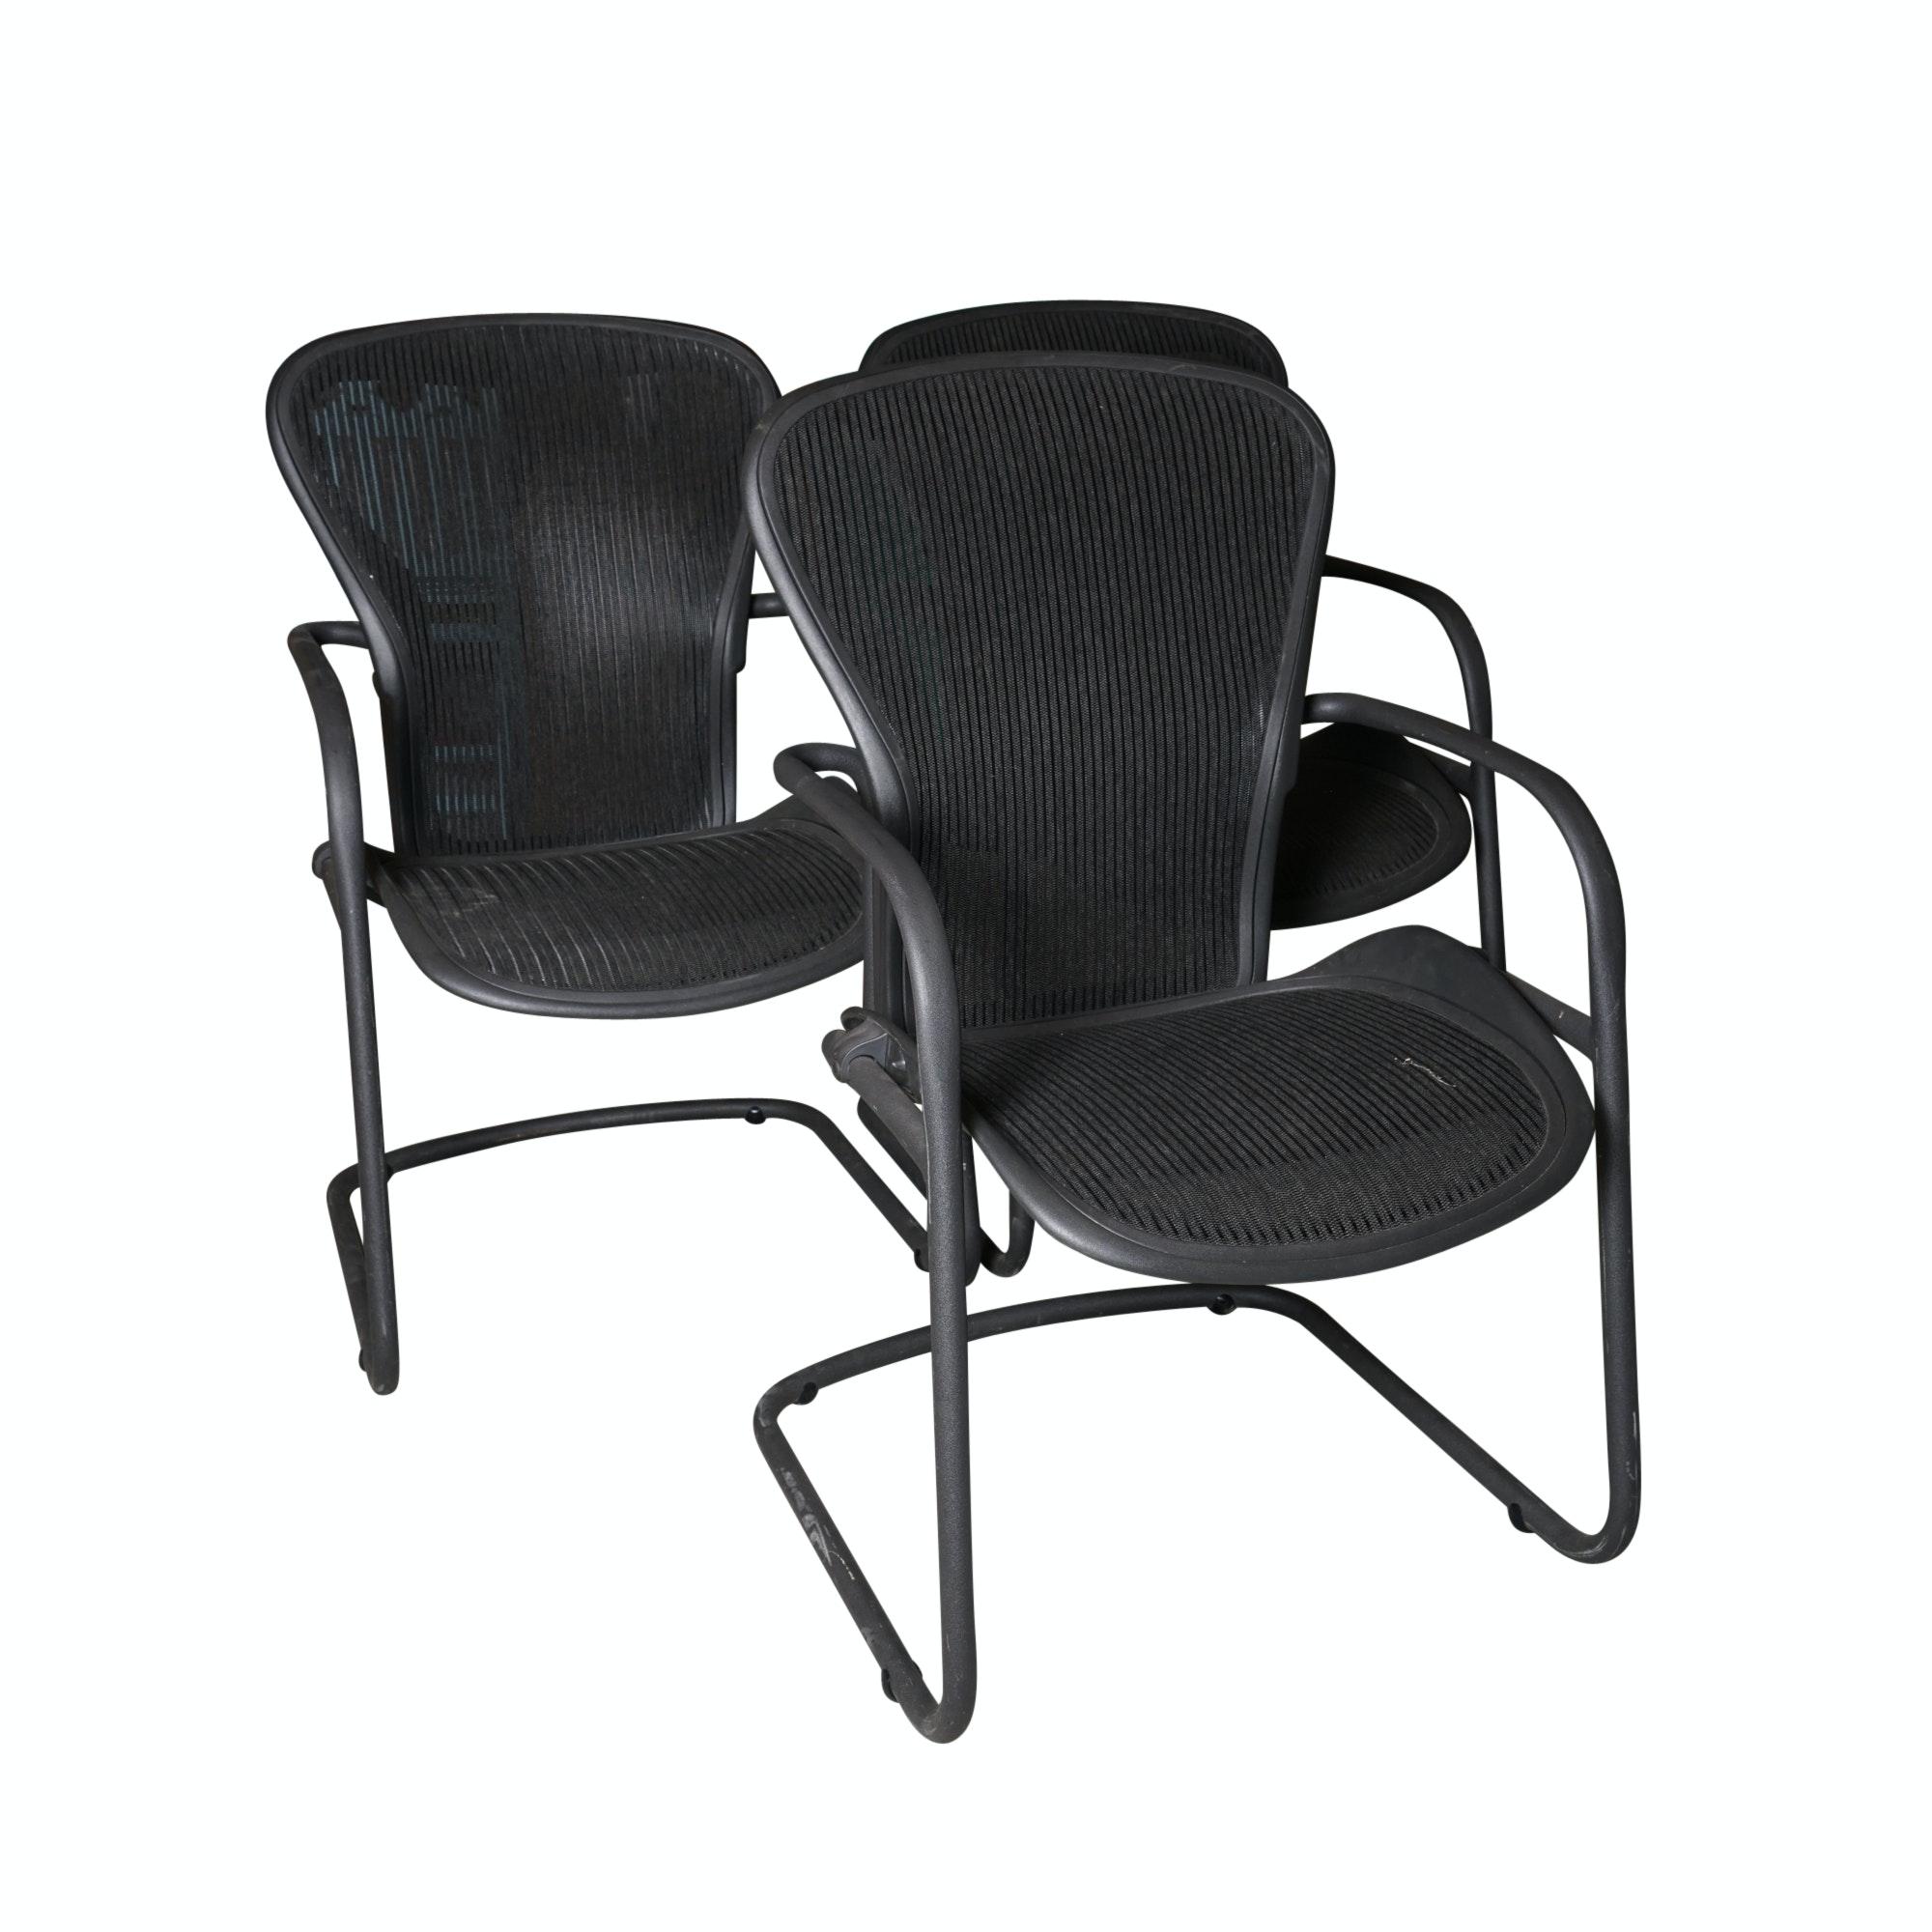 "Three Herman Miller ""Aeron"" Office Side Chairs"